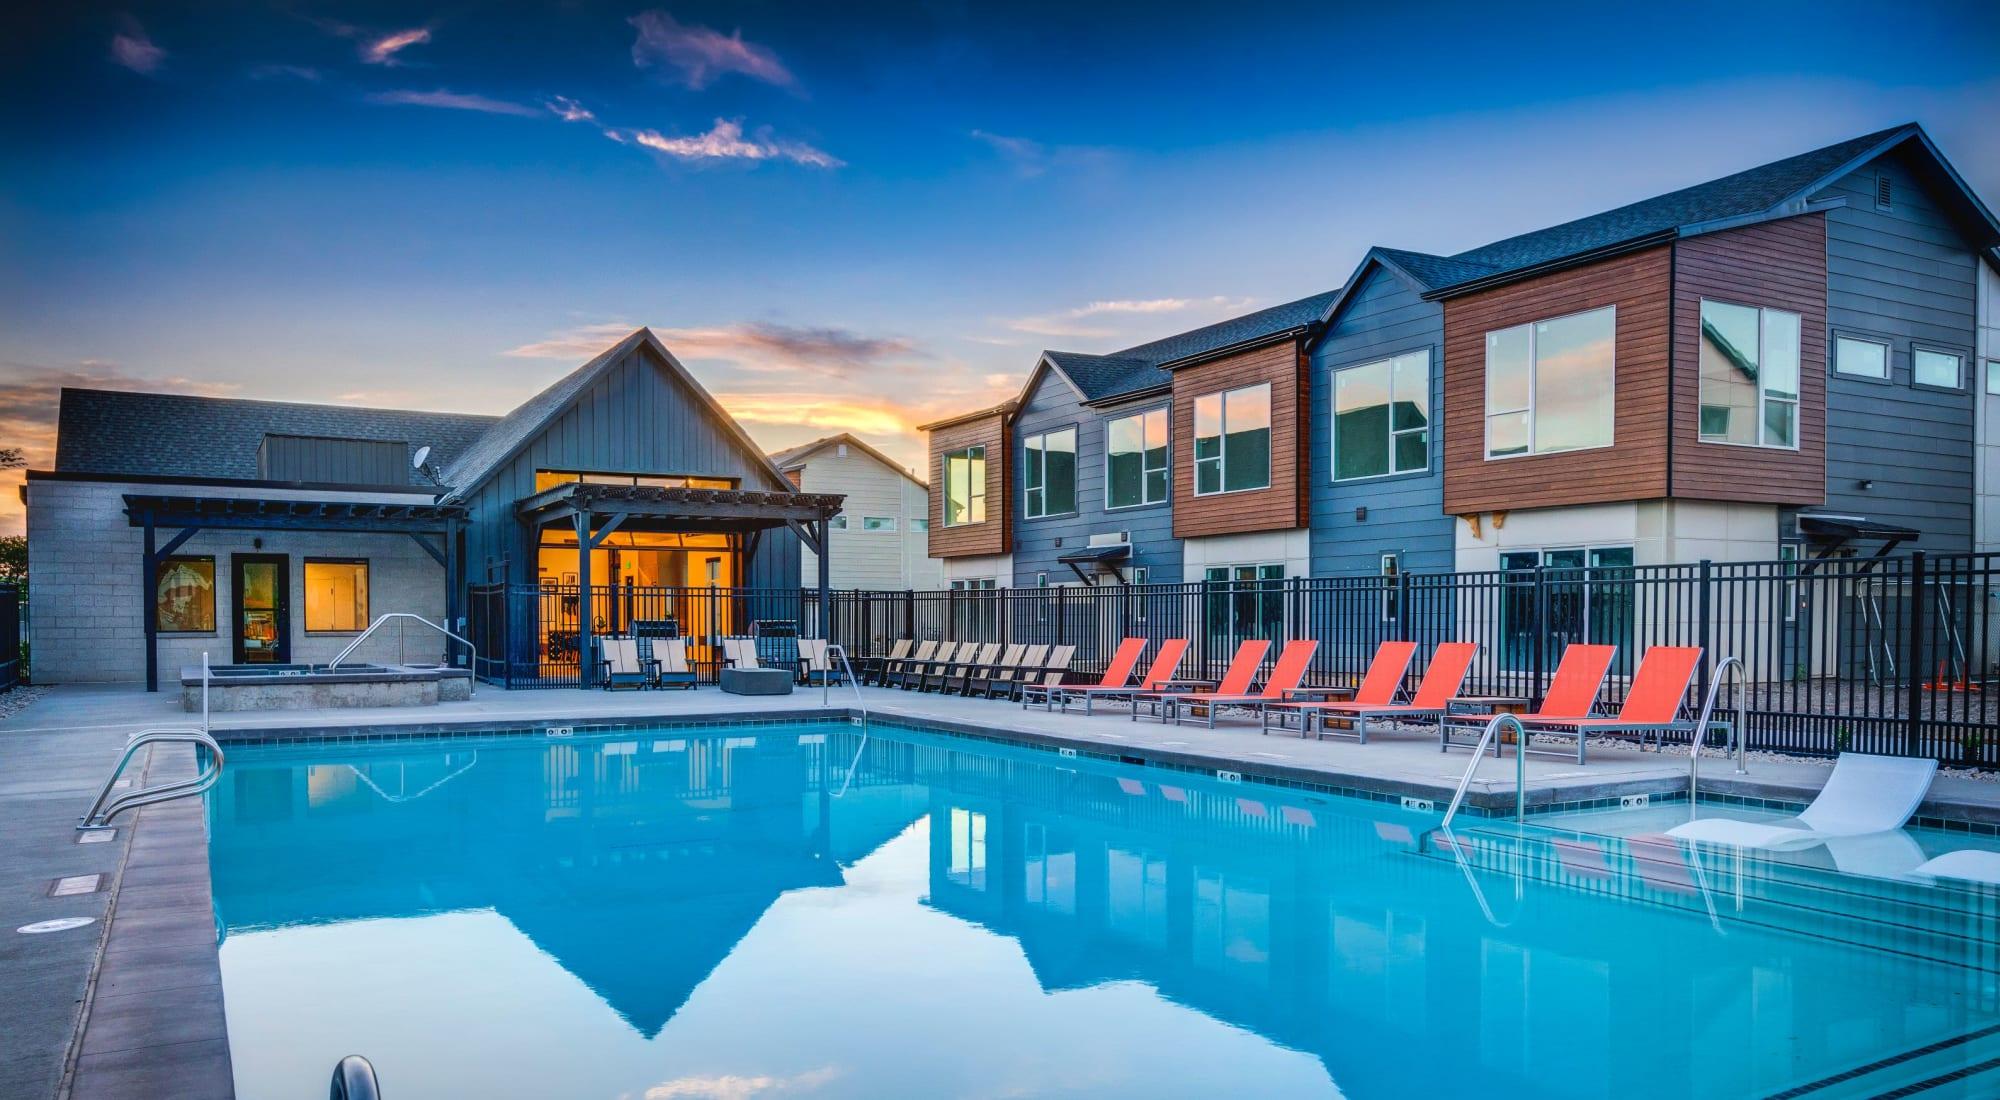 Apartments at Hawthorne Townhomes in South Salt Lake, Utah